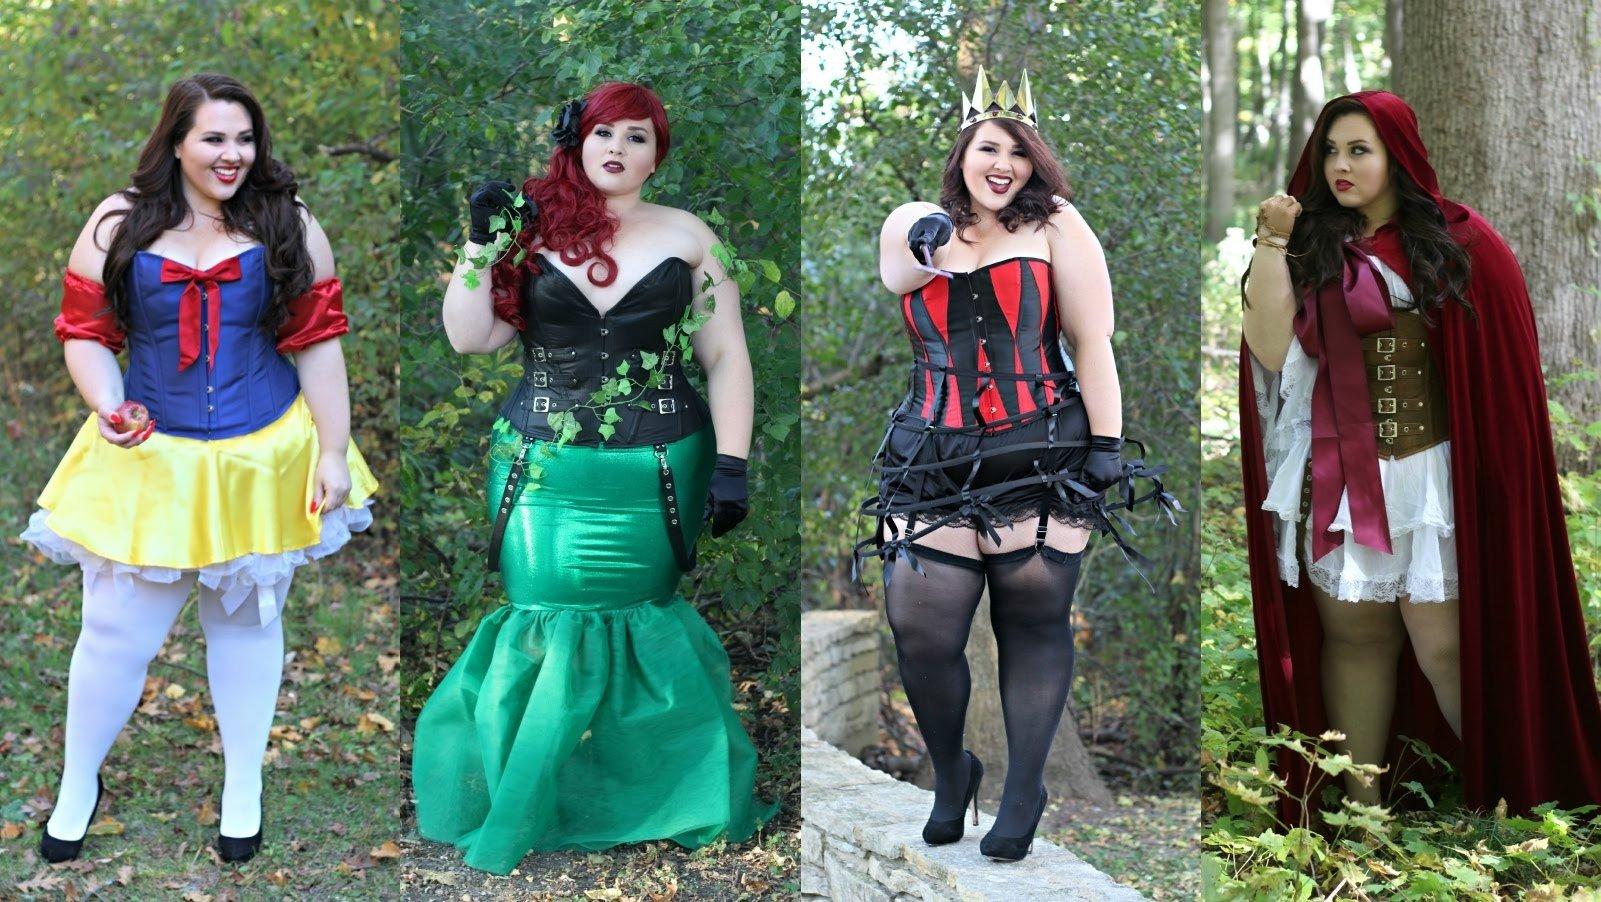 10 Great Homemade Plus Size Halloween Costume Ideas halloween lookbook 2015 plus size costumes youtube 1 2021